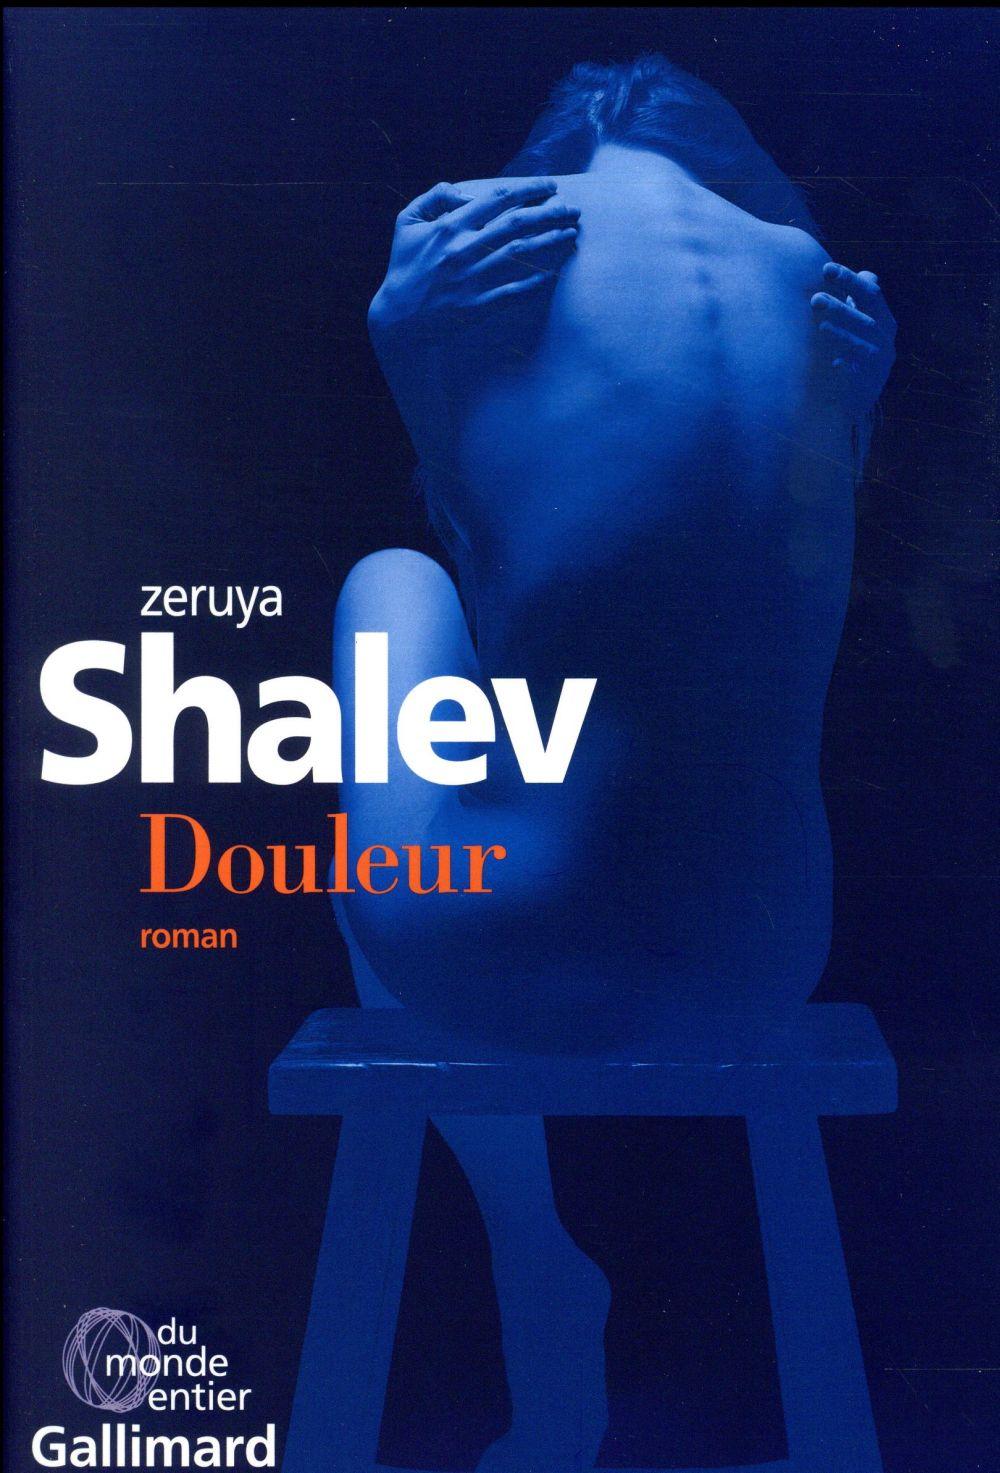 Douleur - Zeruya Shalev - Gallimard